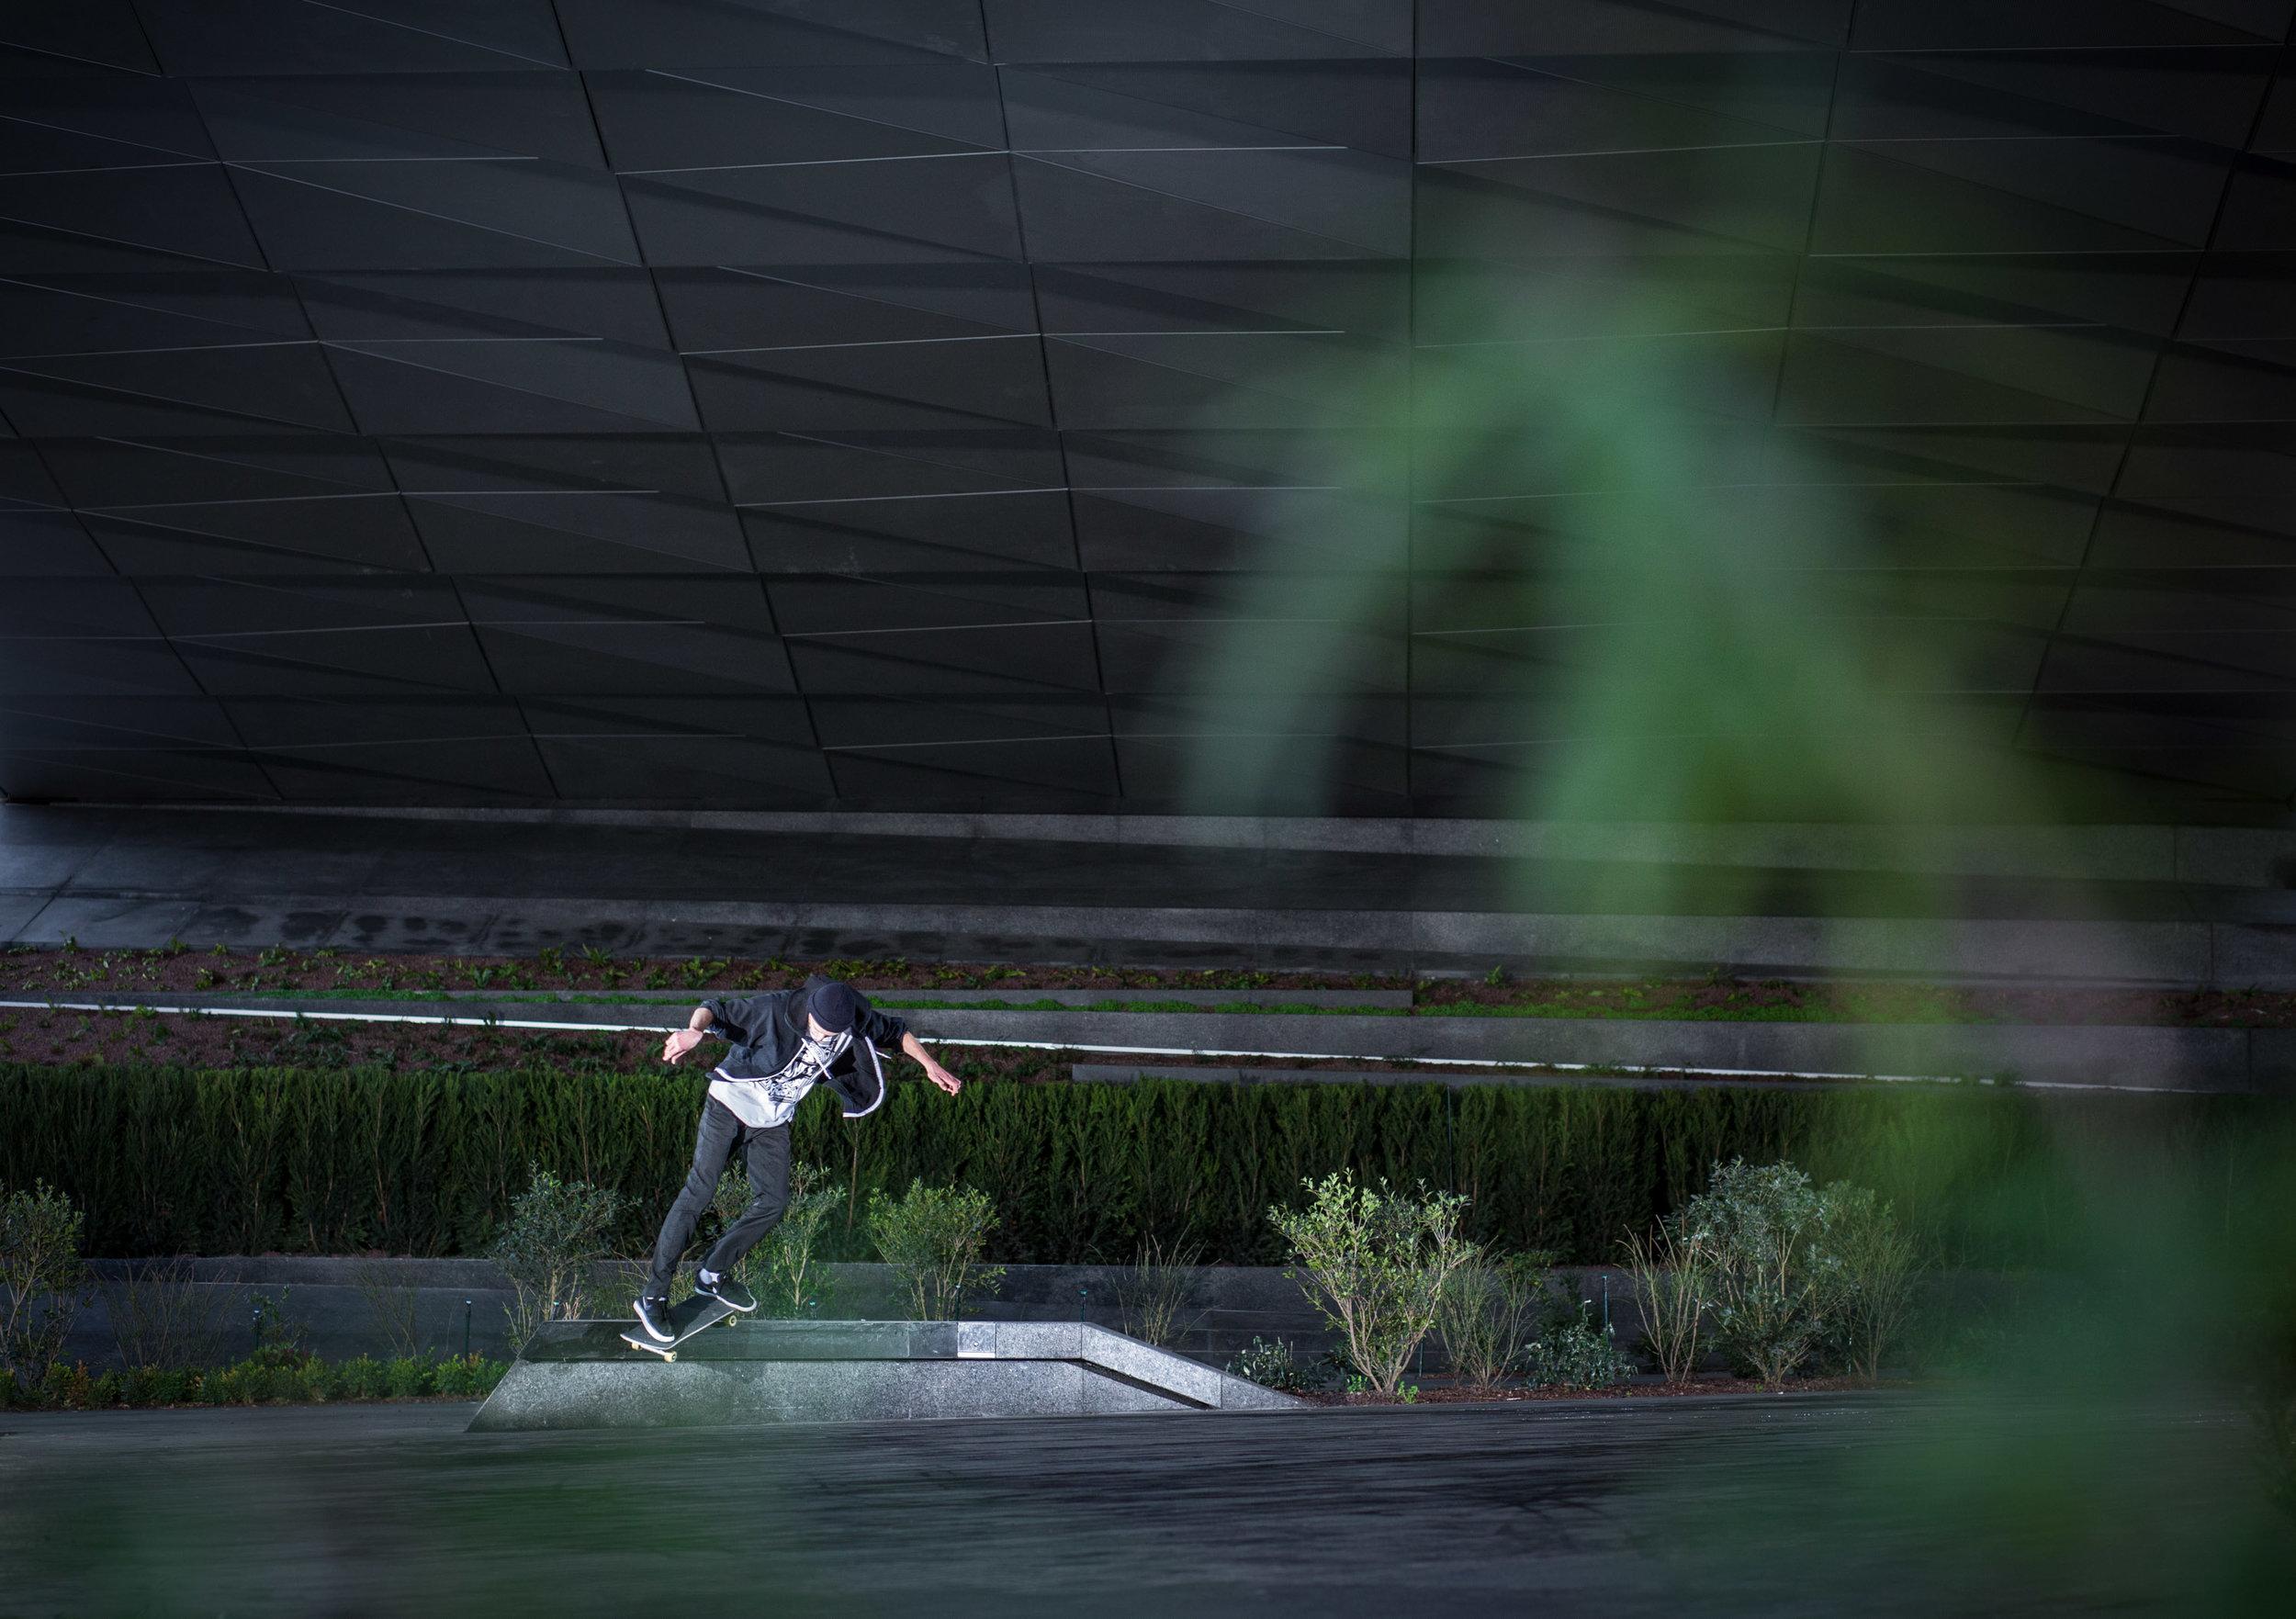 Romain Vanherp - Backside smith grind